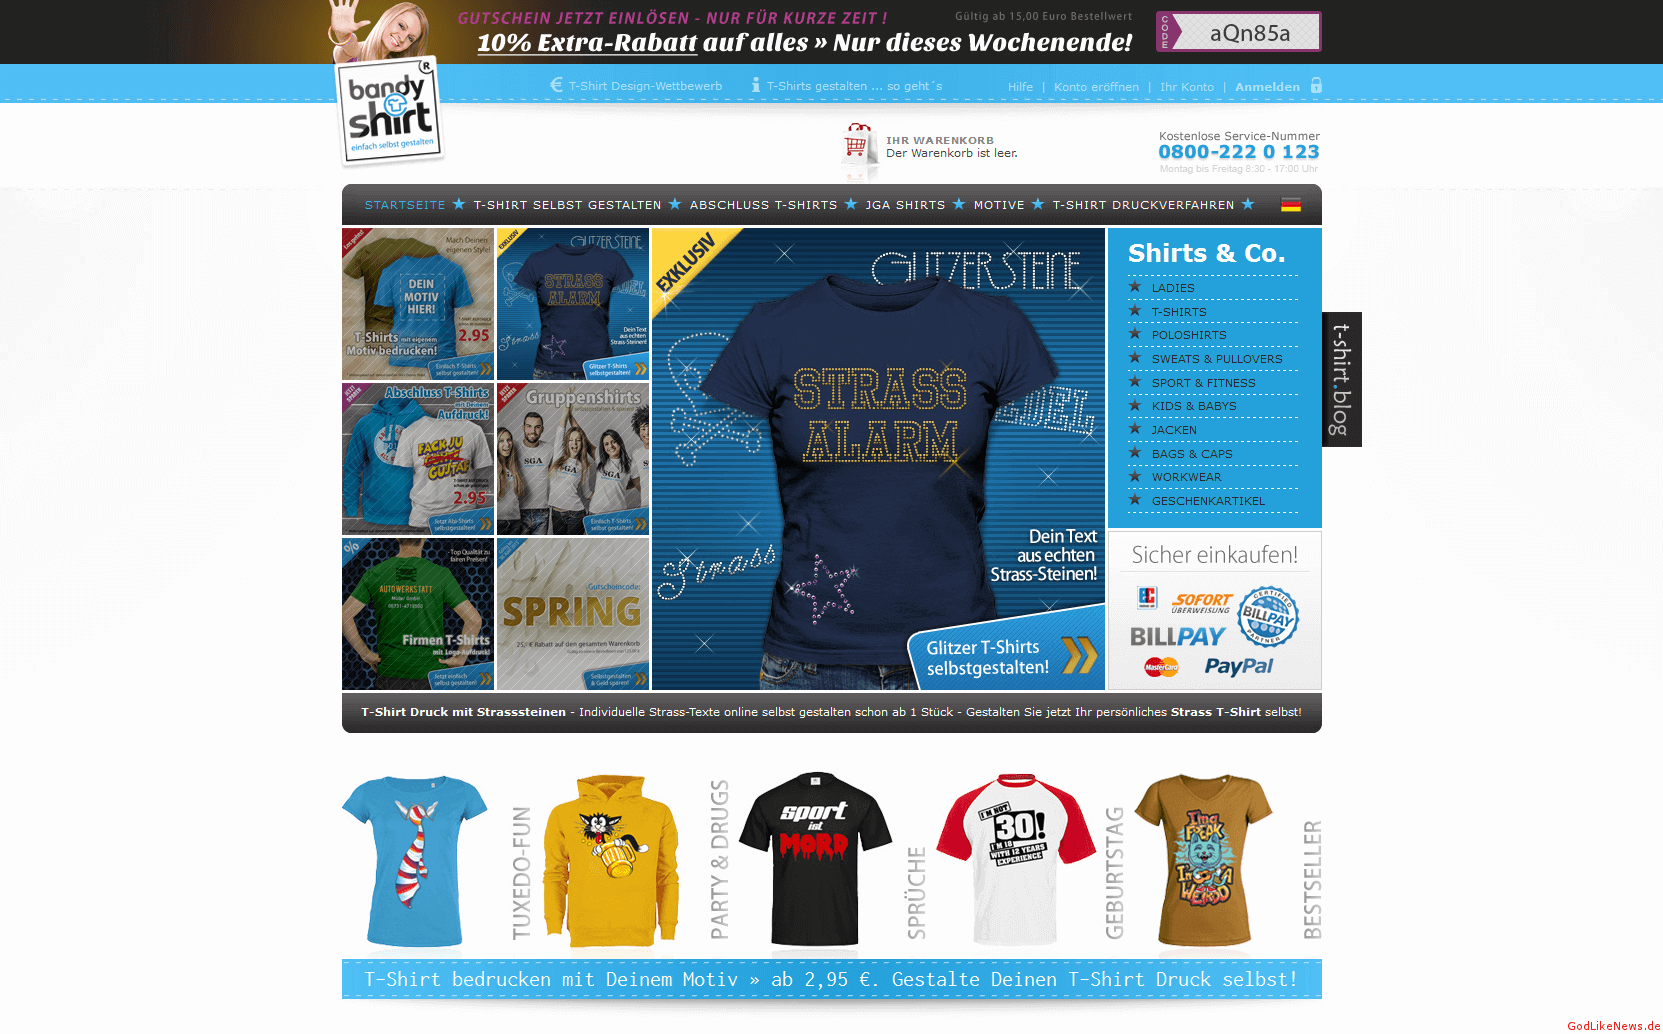 finest selection 8aef5 77f07 Abschluss T Shirts Selbst Gestalten Billig - Nils Stucki ...